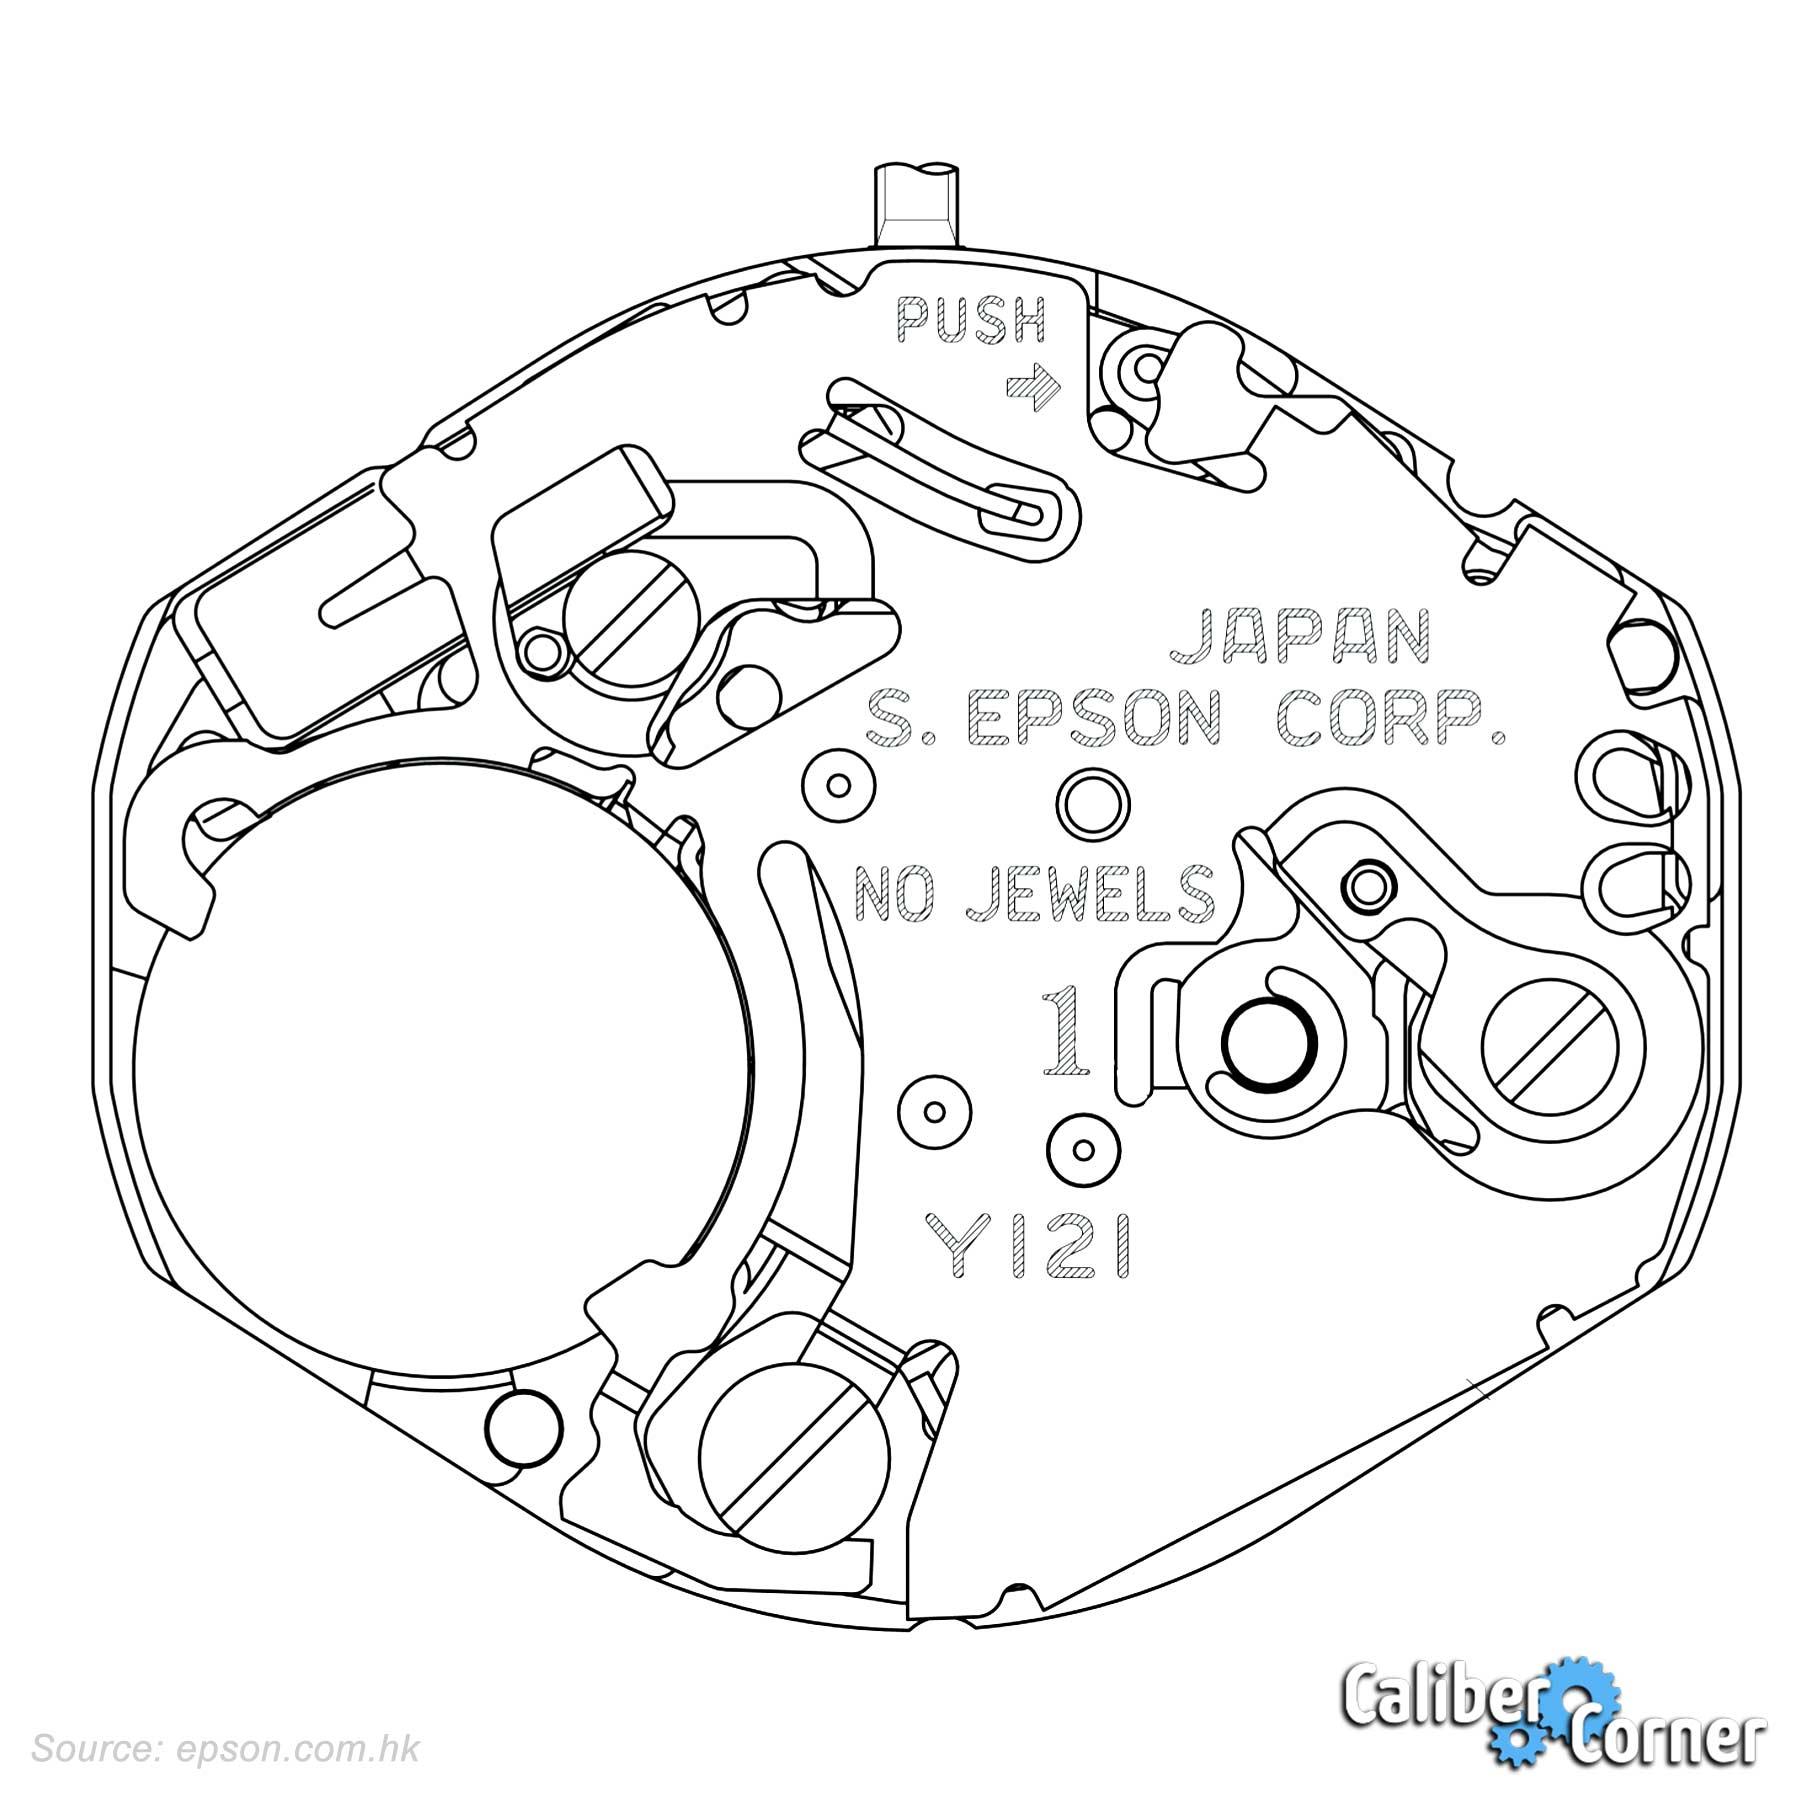 Epson Seiko Caliber Y121 Drawing